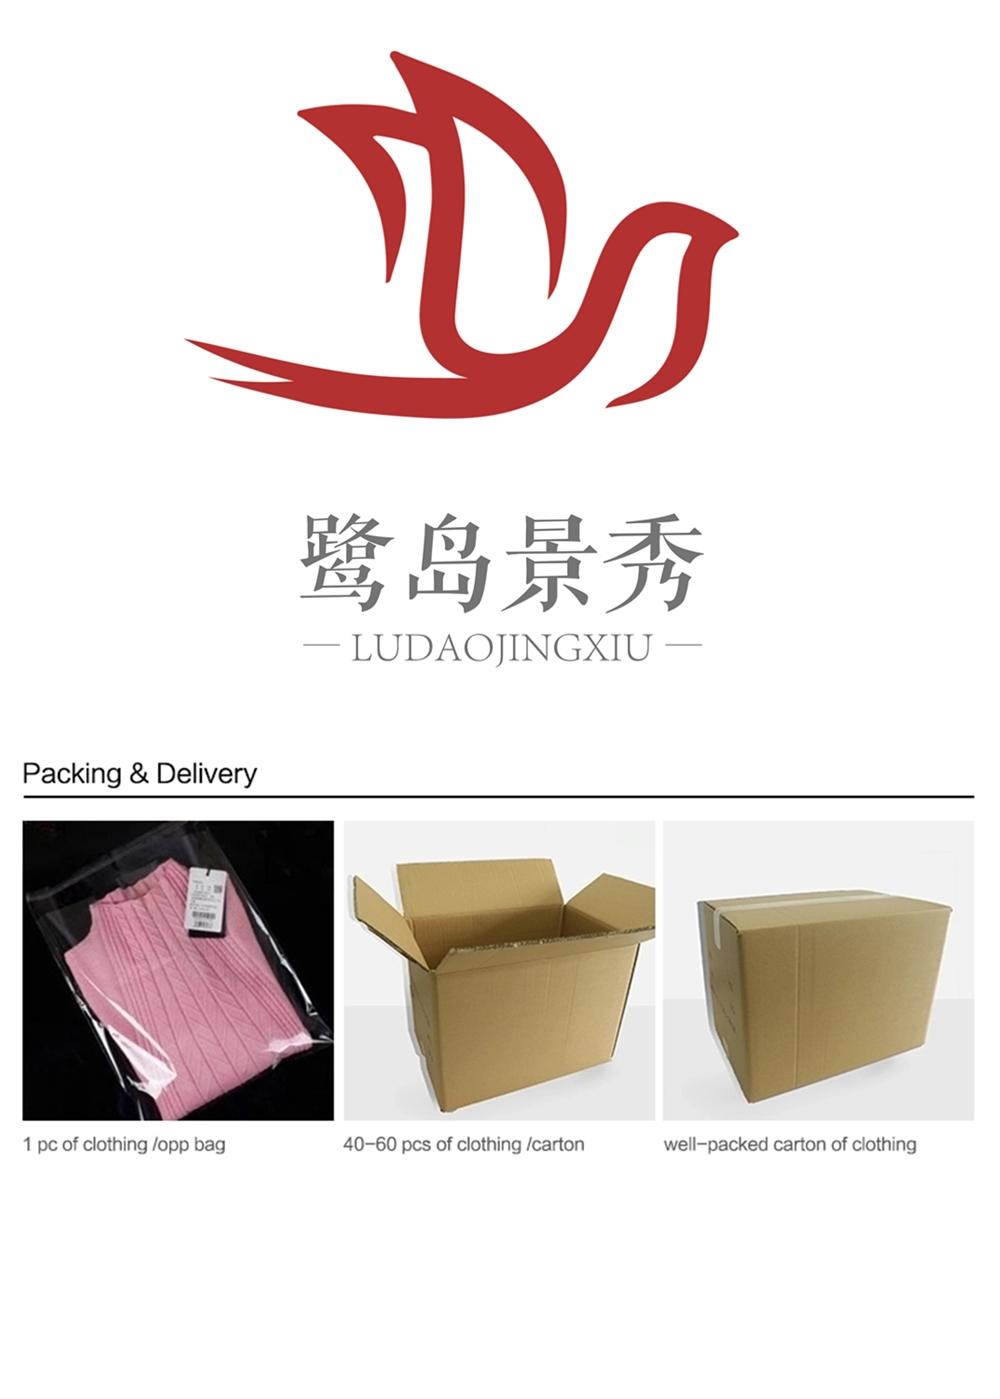 LDJX-C293แฟชั่นโลโก้ที่กำหนดเองเซ็กซี่สุภาพสตรีกางเกงไม่มีรอยต่อสวมใส่ออกกำลังกายฟิตเนสโยคะกางเกงขาสั้น